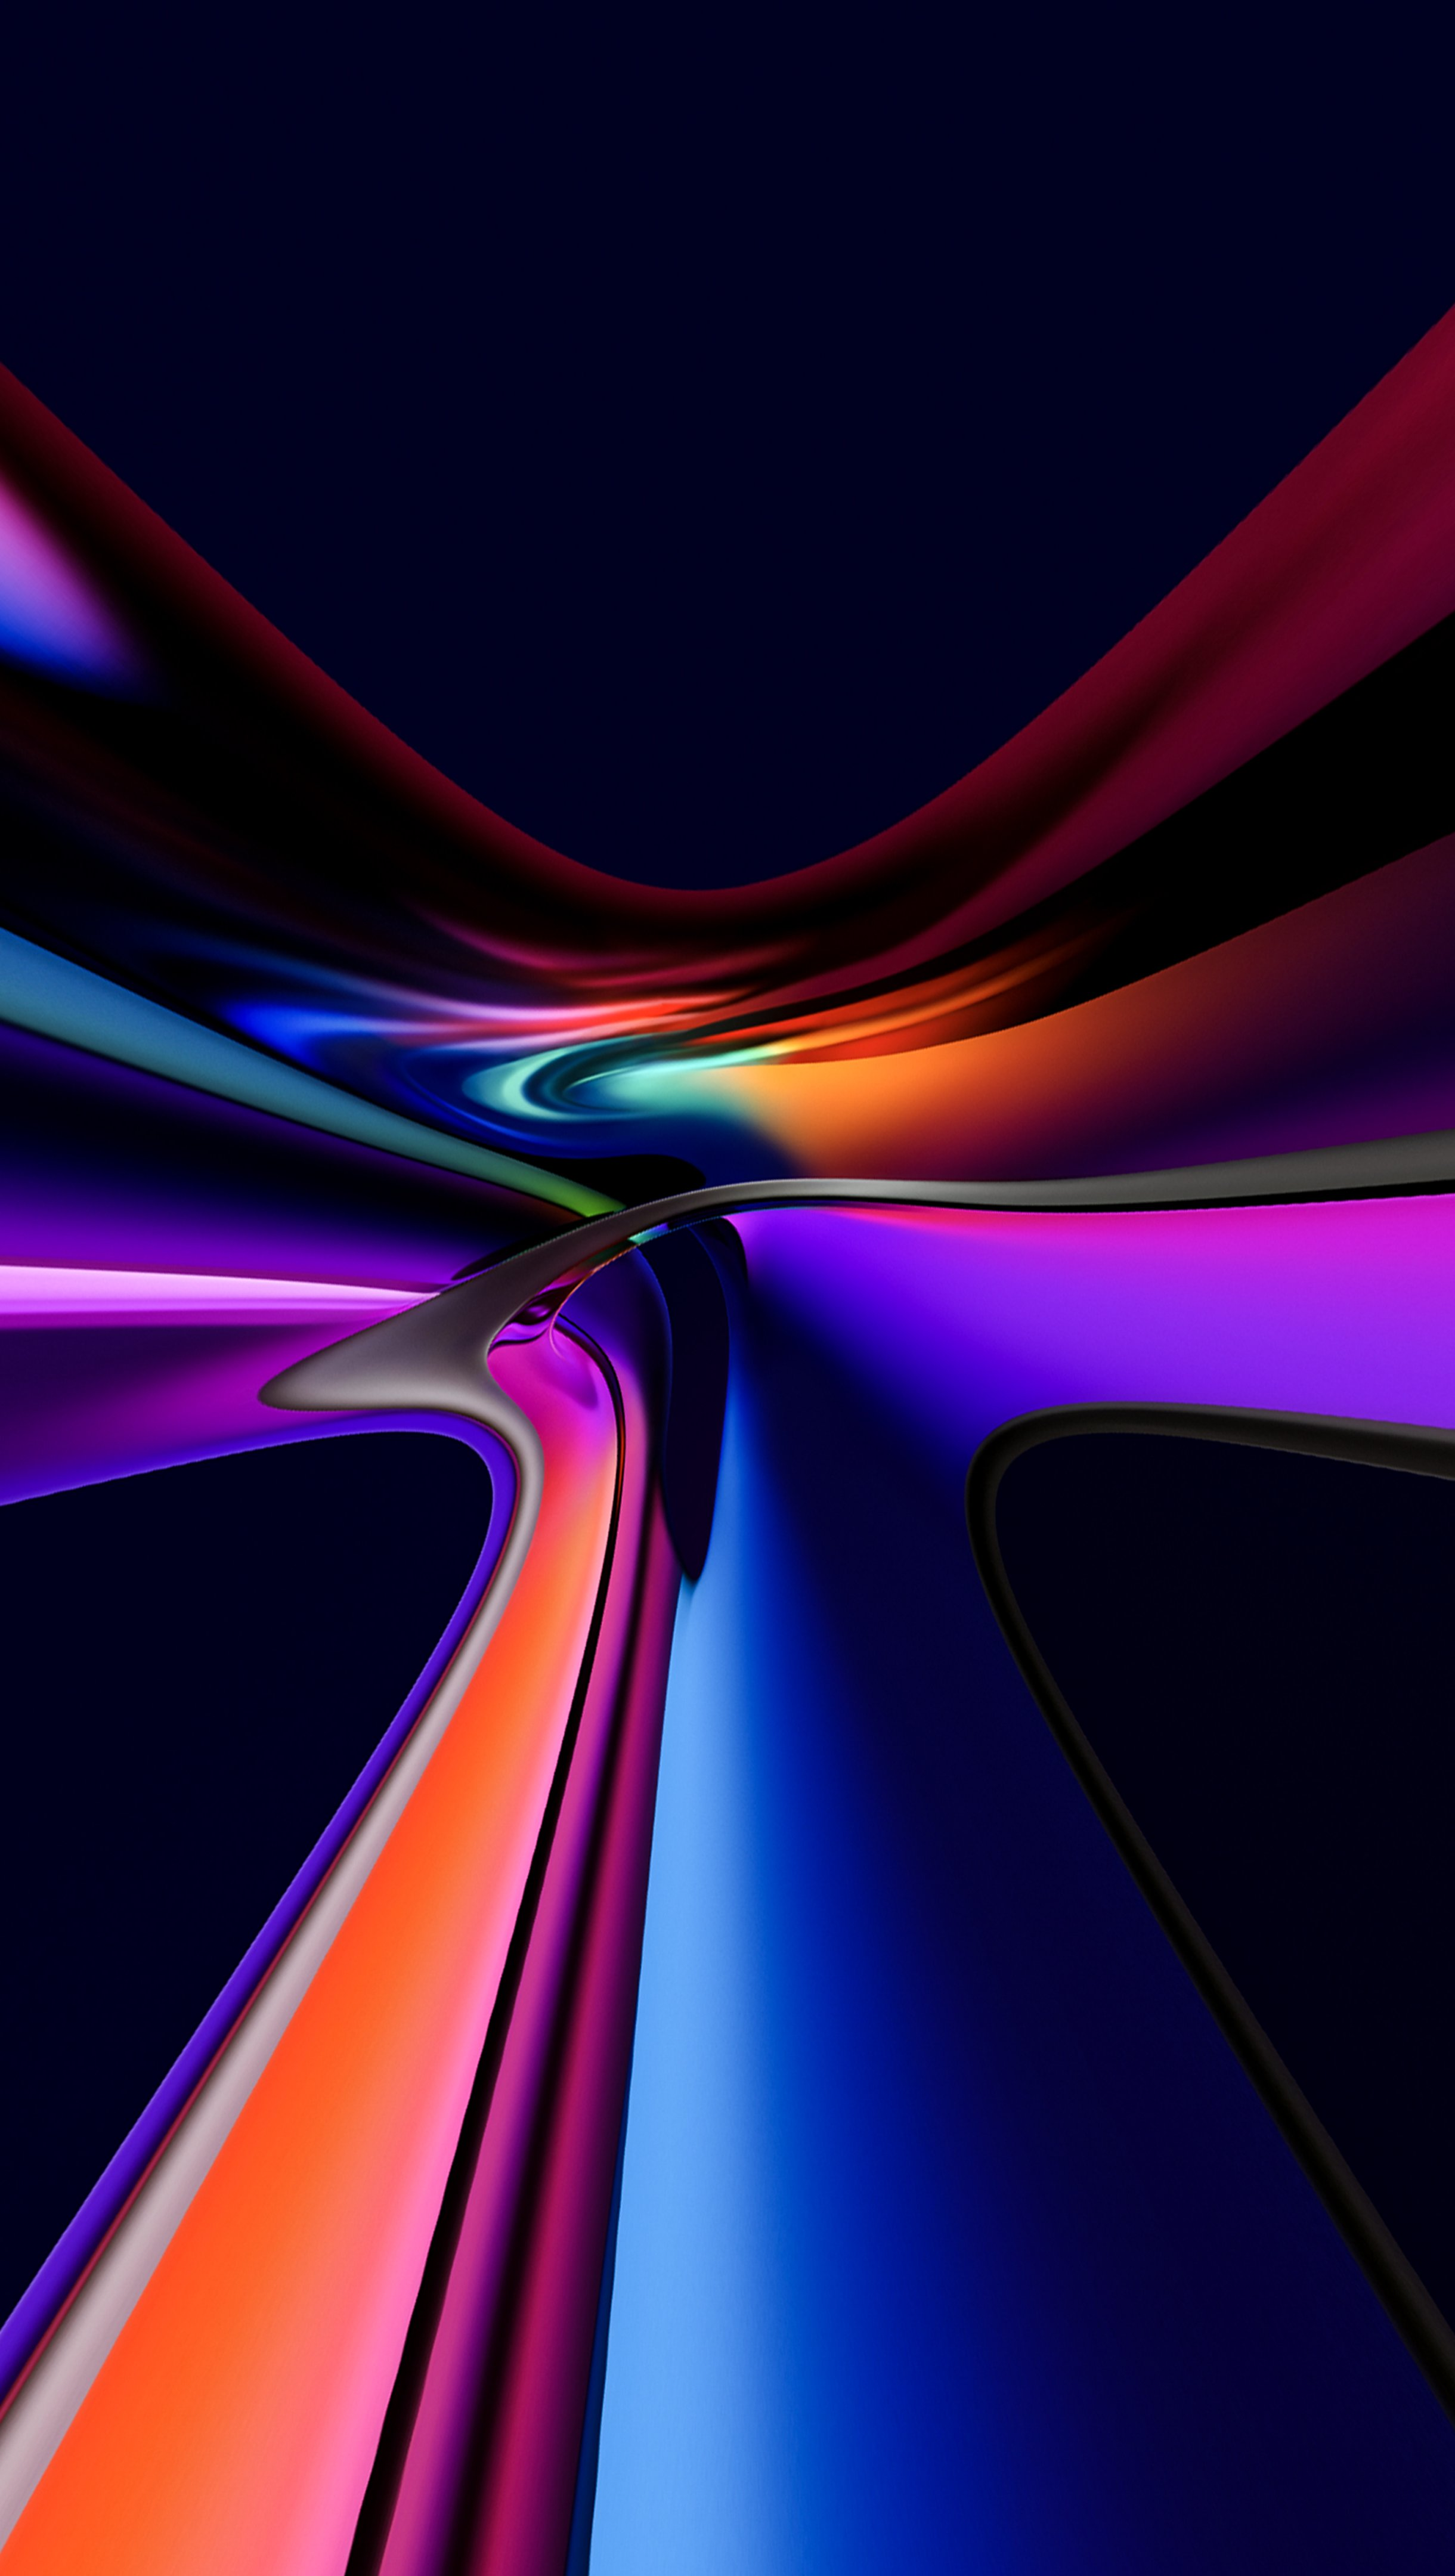 Fondos de pantalla Vidrio mezclado de colores Vertical